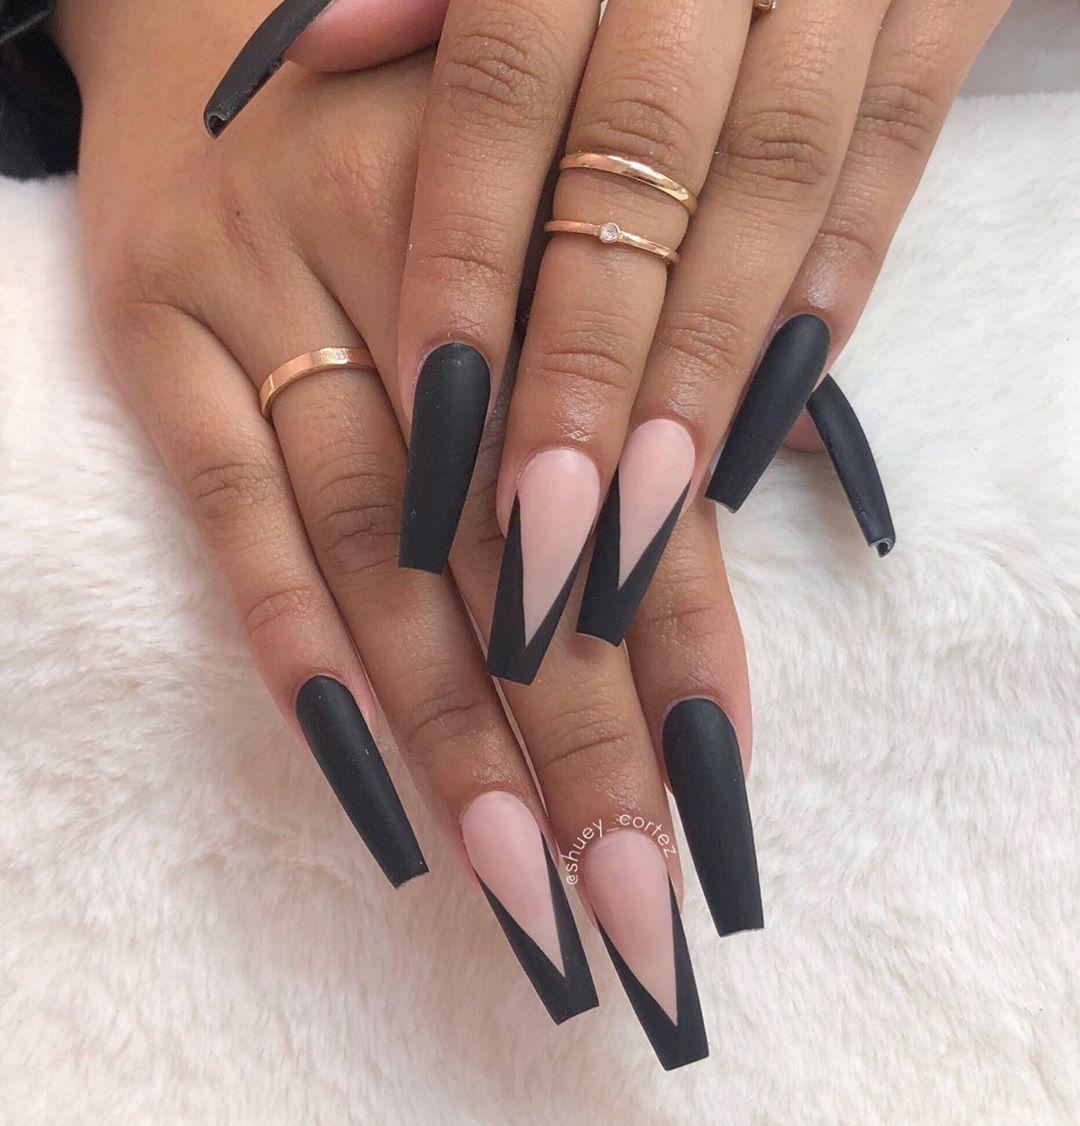 Shuey Cortez On Instagram V Tips Vtipnails Blacknails Matteblacknails Matteblack Coffinnai Coffin Nails Long Nail Designs Black Acrylic Nails